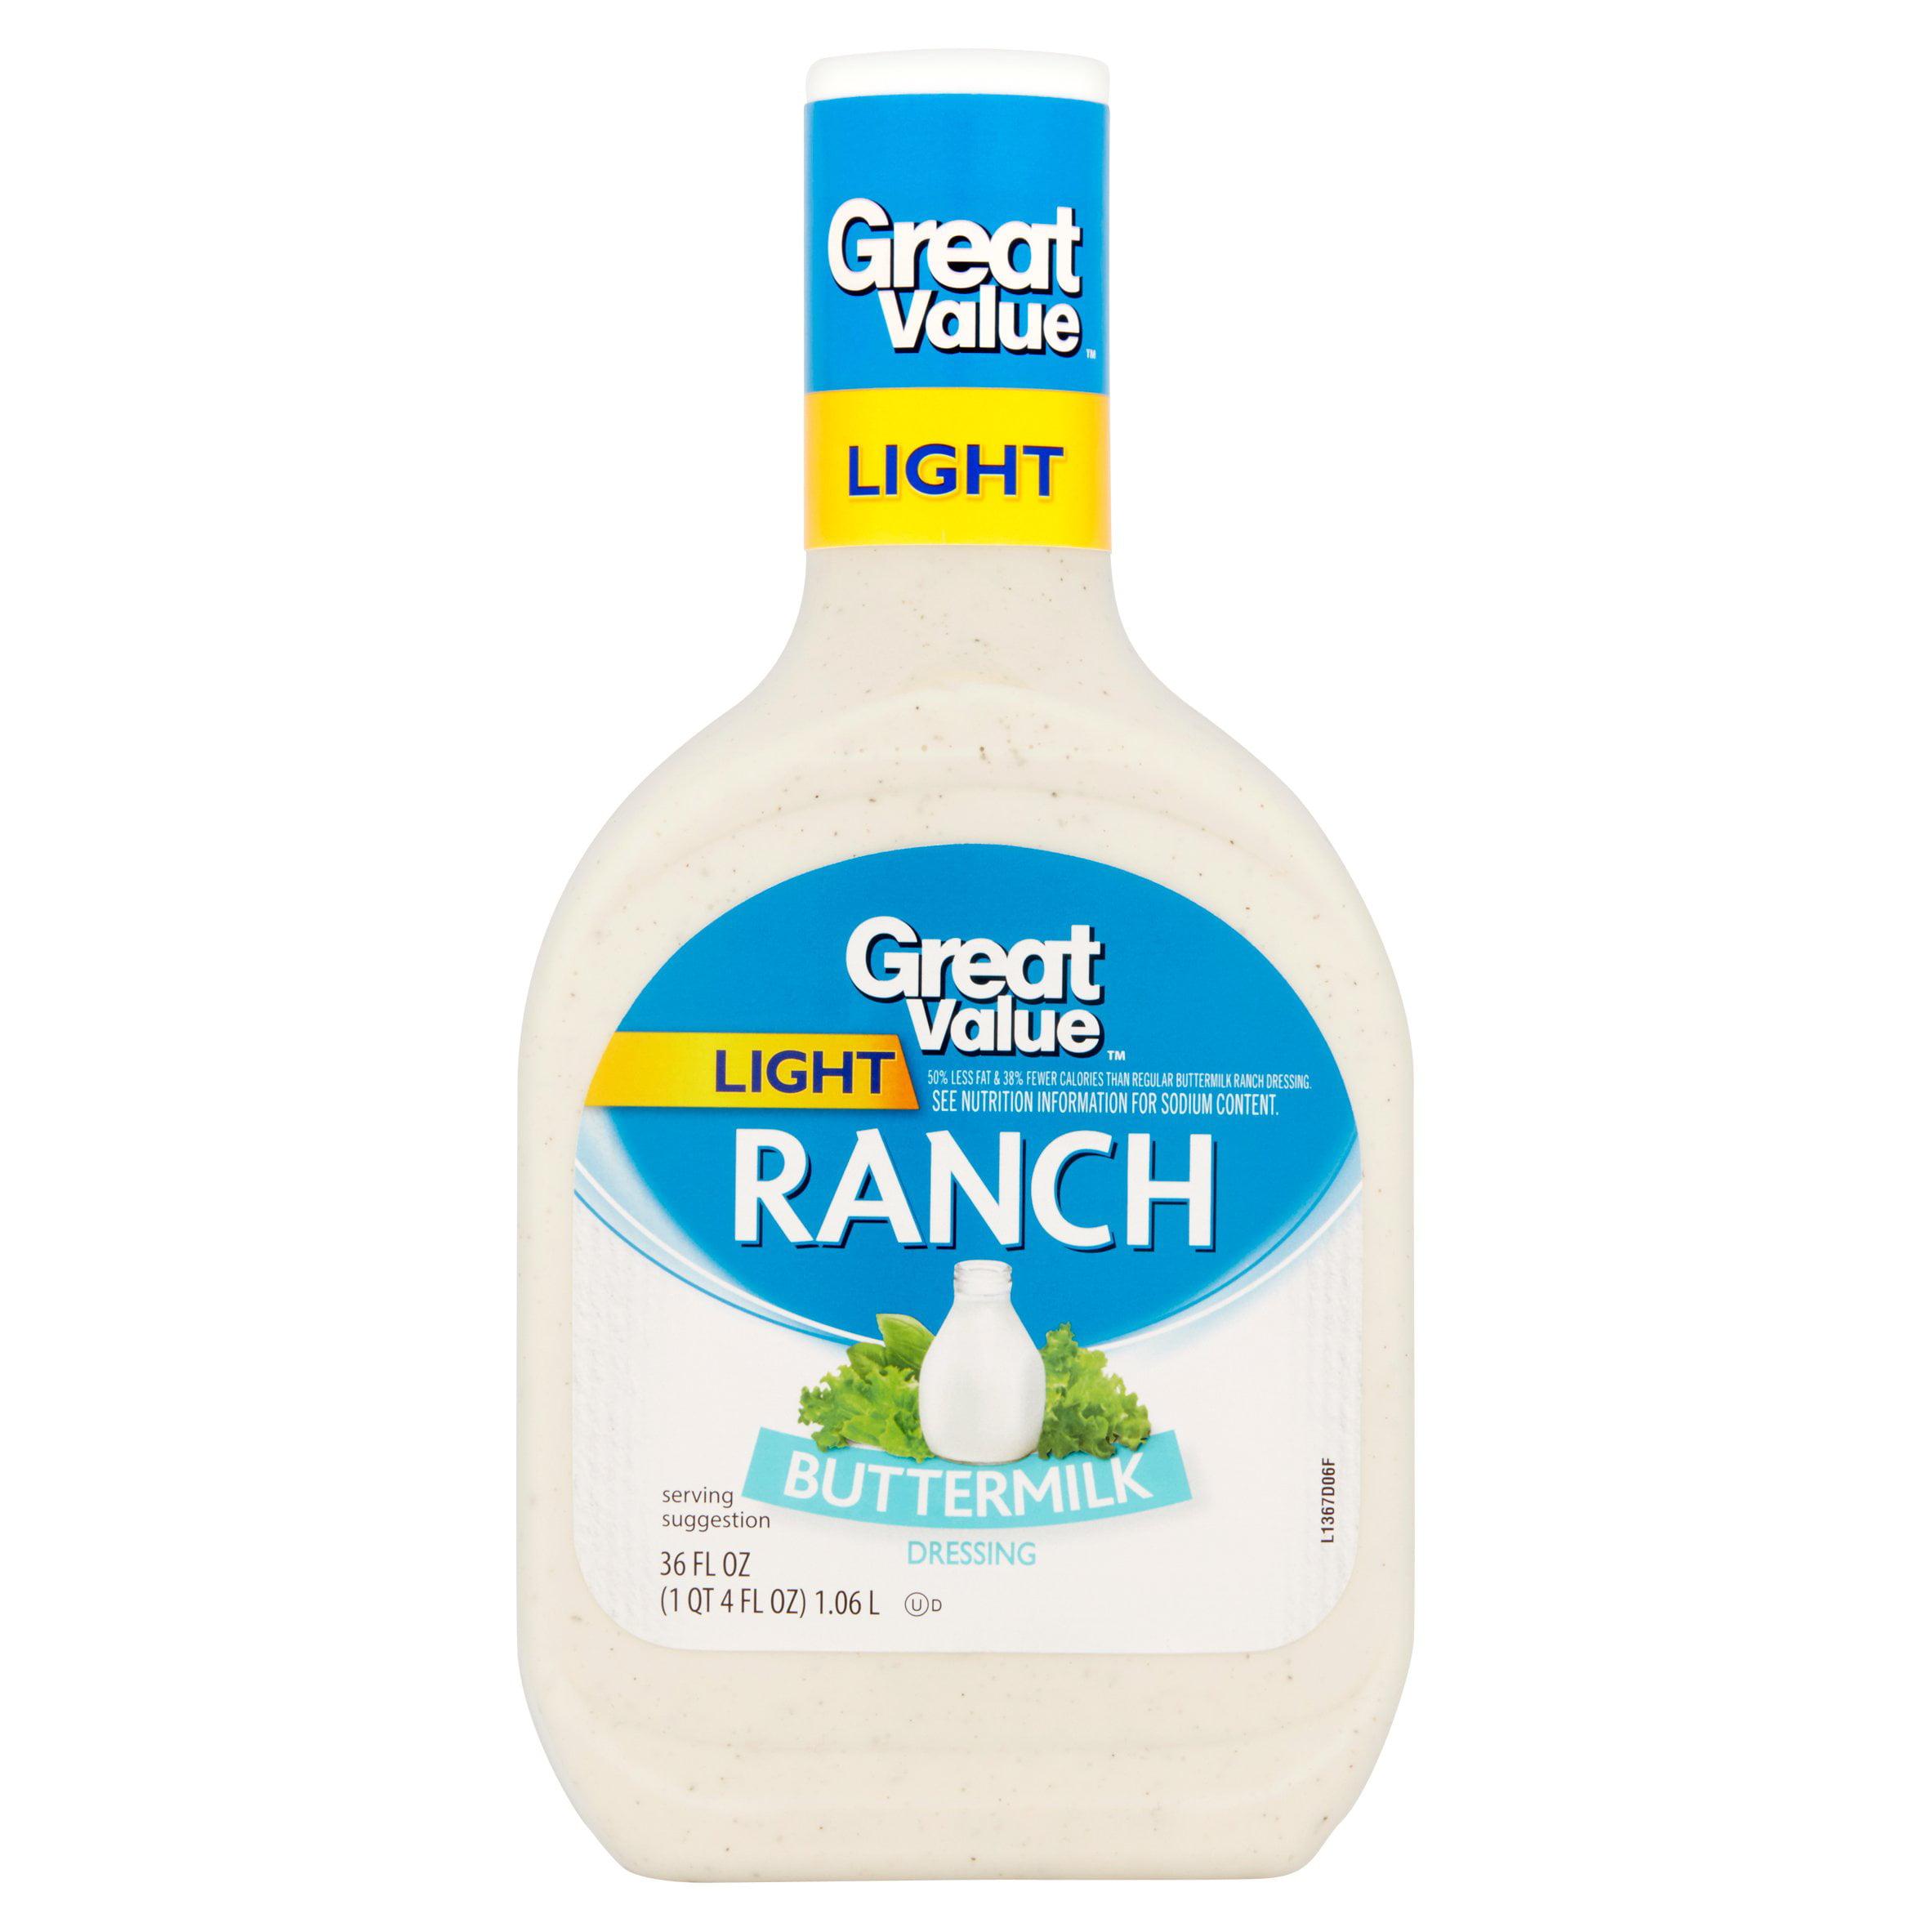 (2 Pack) Great Value Light Buttermilk Ranch Dressing, 26 oz